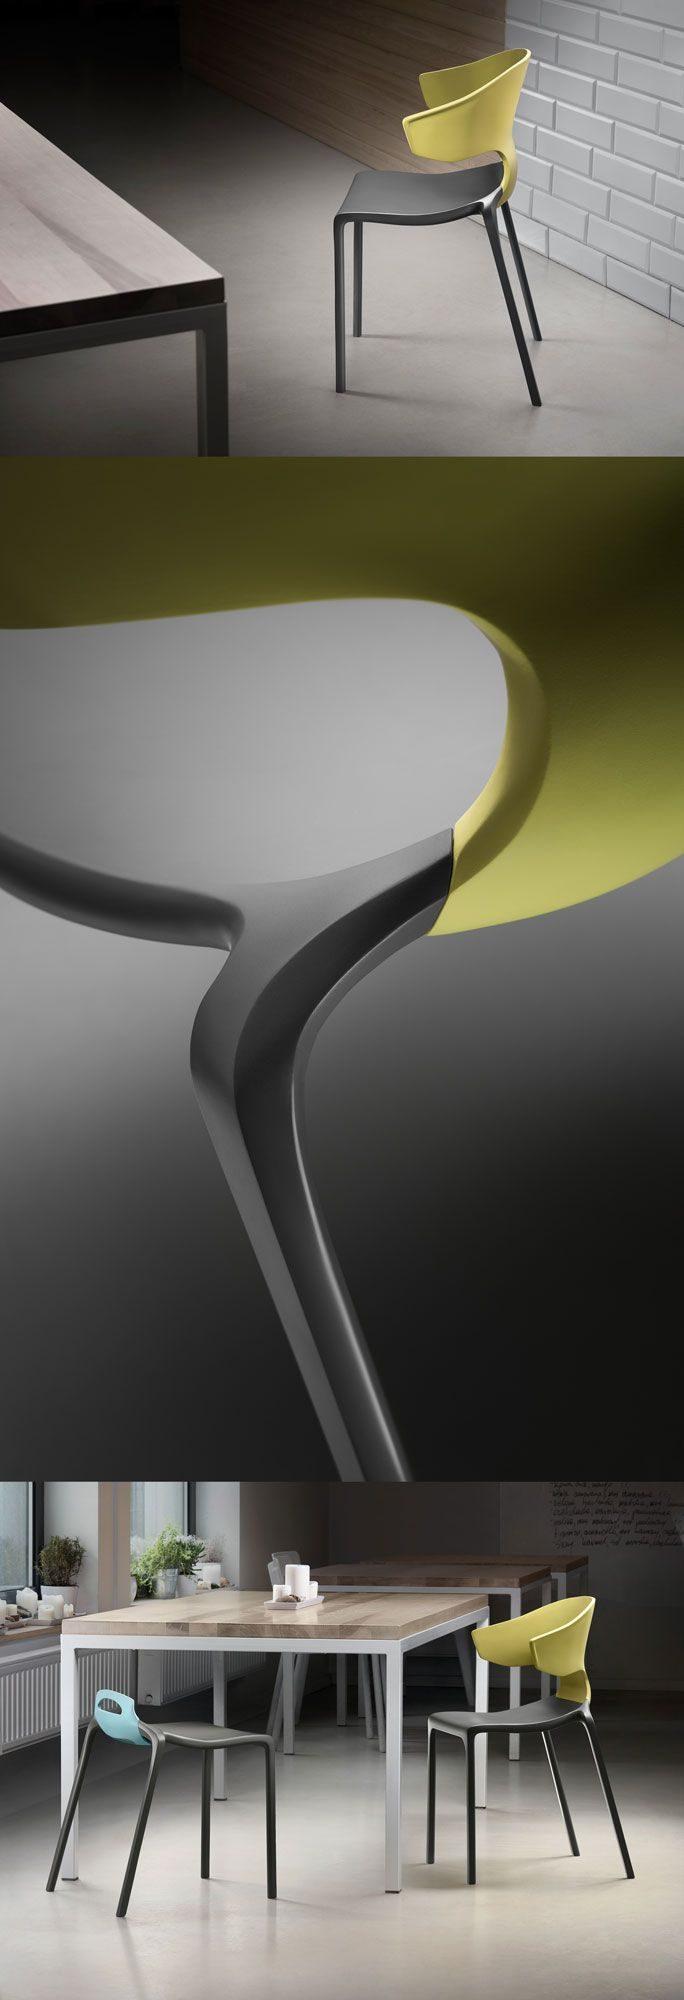 Klaudia Kasprzak - Tuoli - Design-Inspiration.net